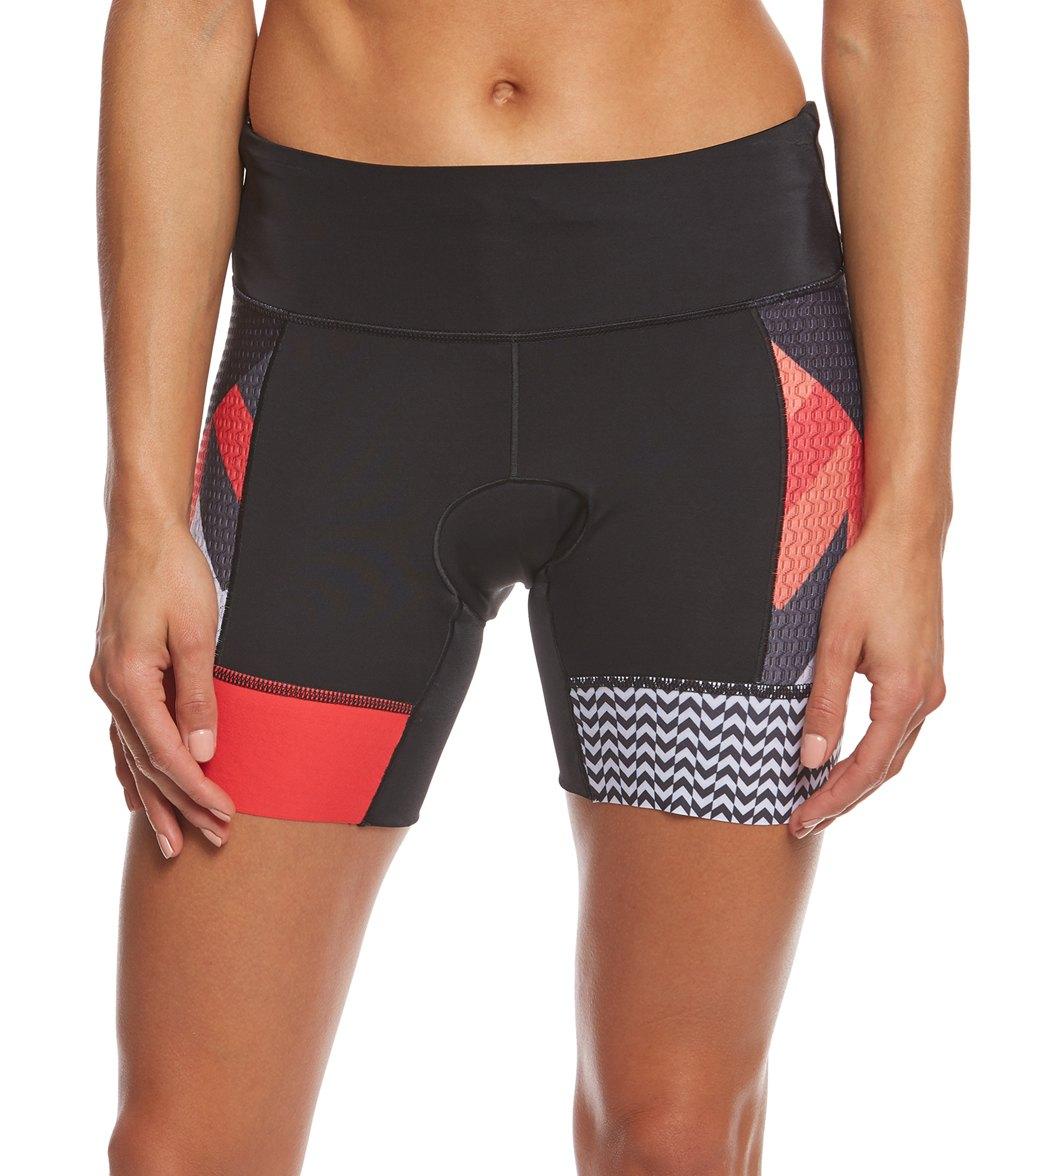 Zoot Women s Ultra Tri 6 Inch Short at SwimOutlet.com - Free Shipping d5a8bdb155